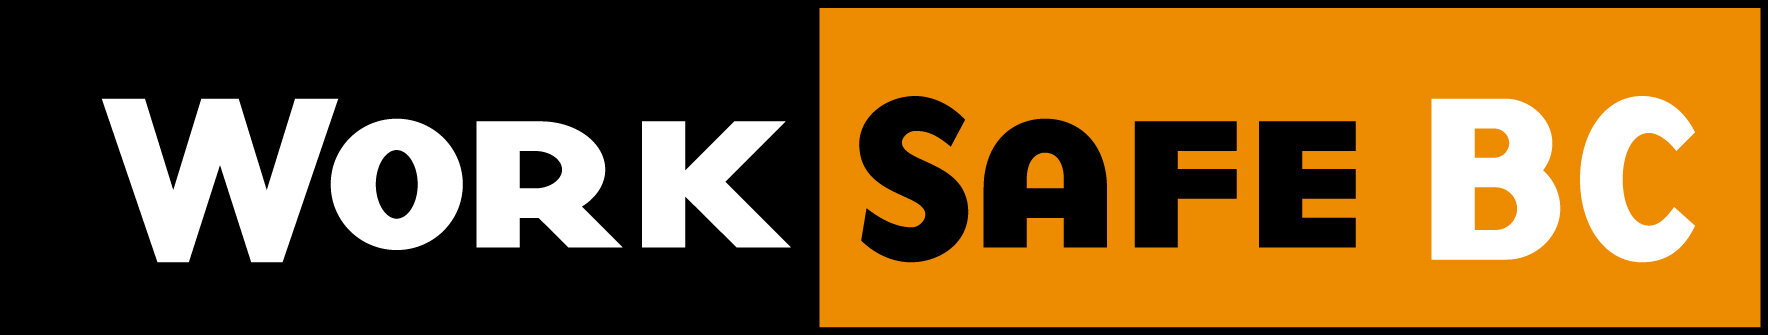 worksafe-bc-logo